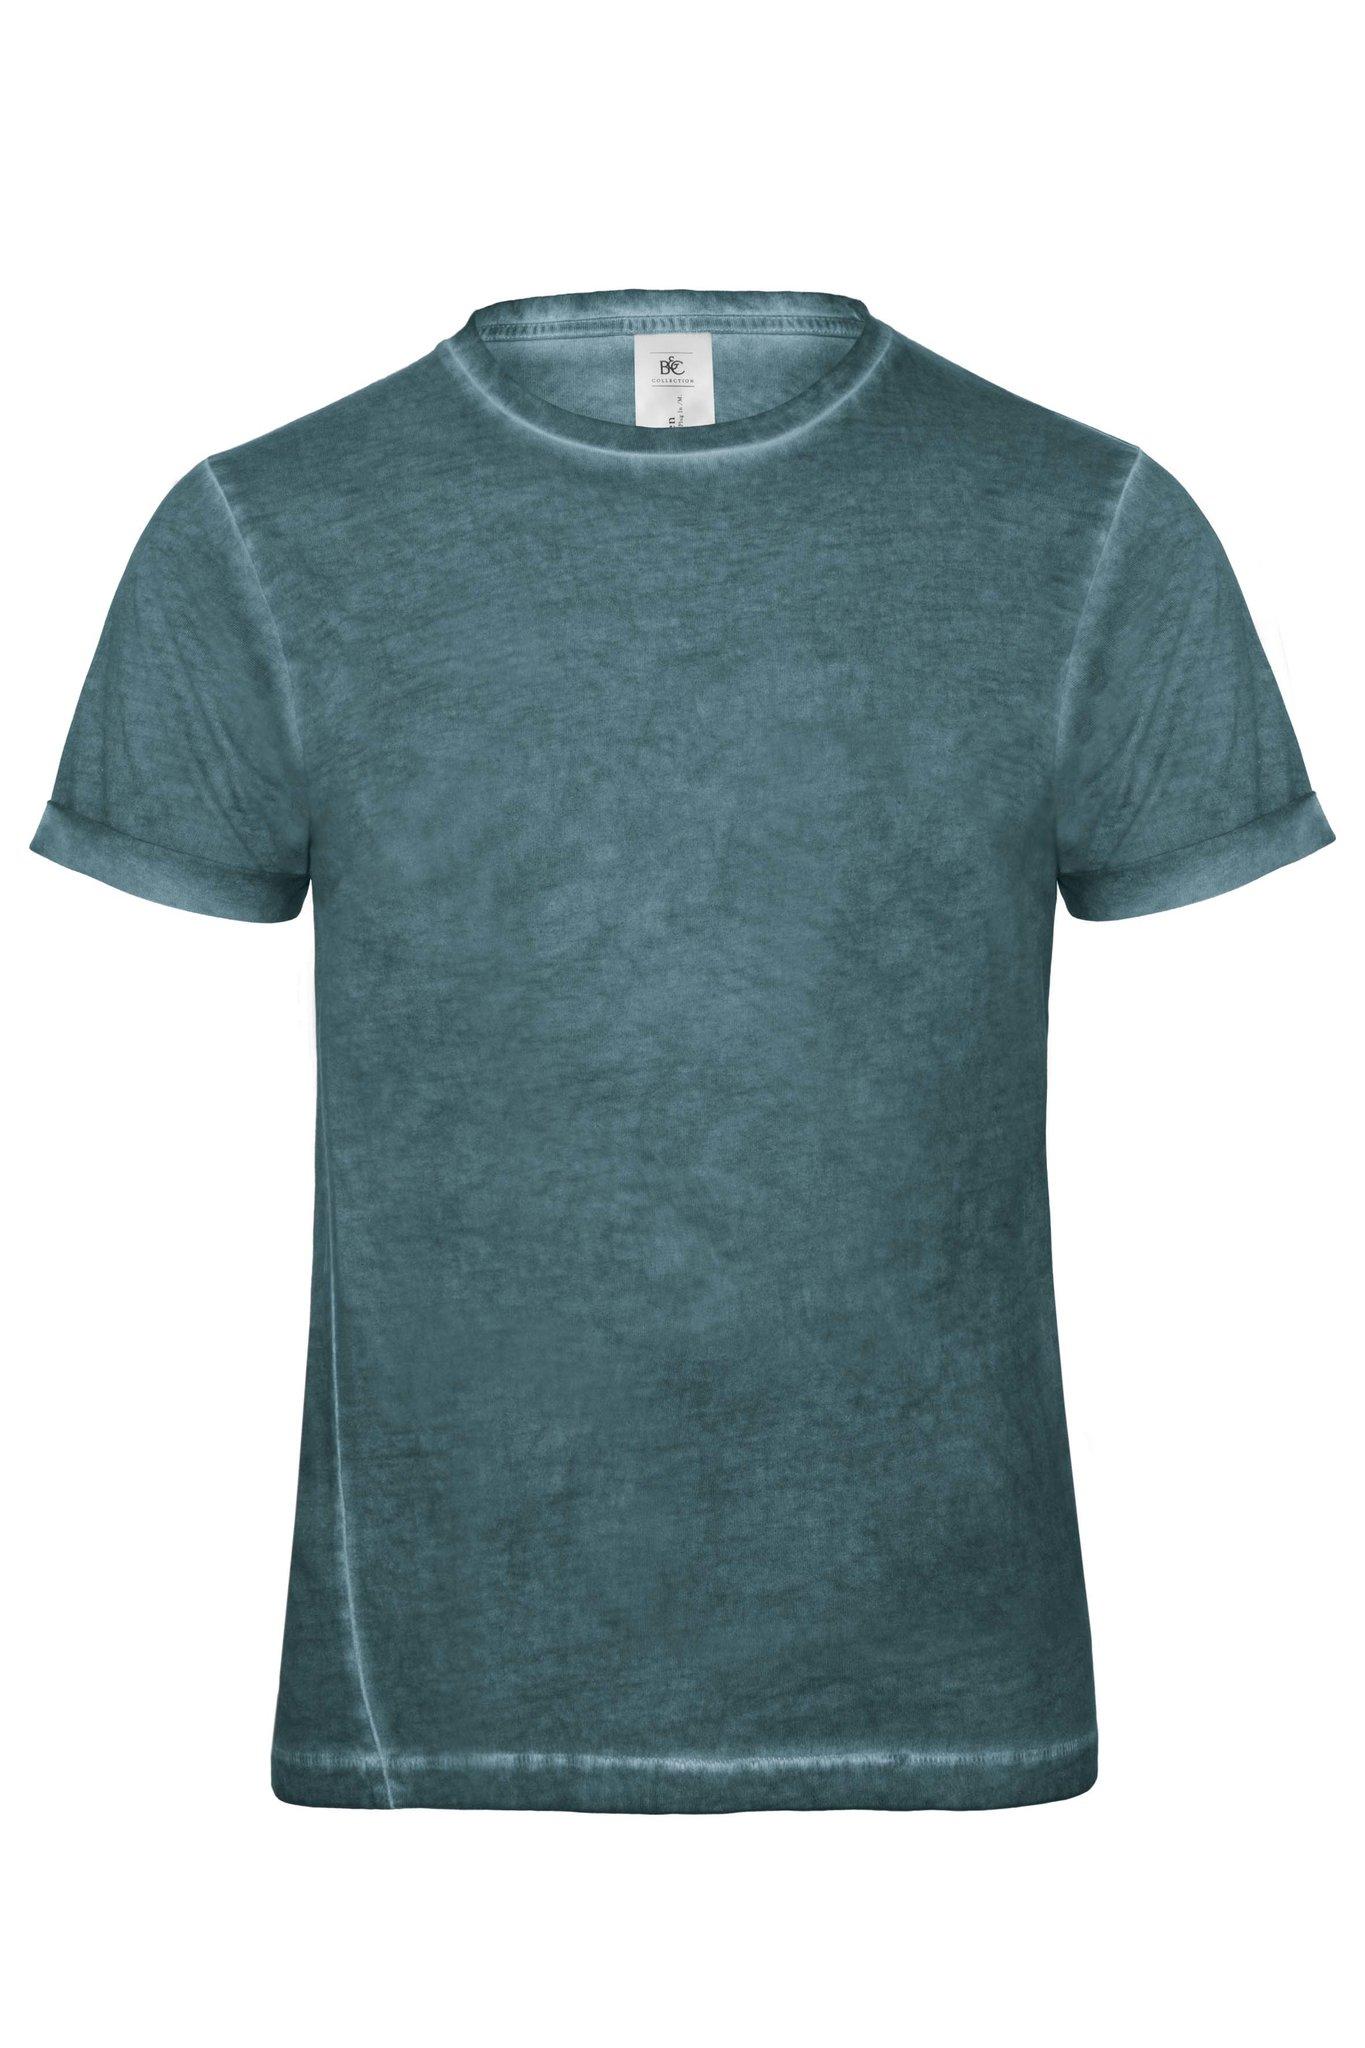 T-shirt personnalisable Plug In - t-shirt promotionnel